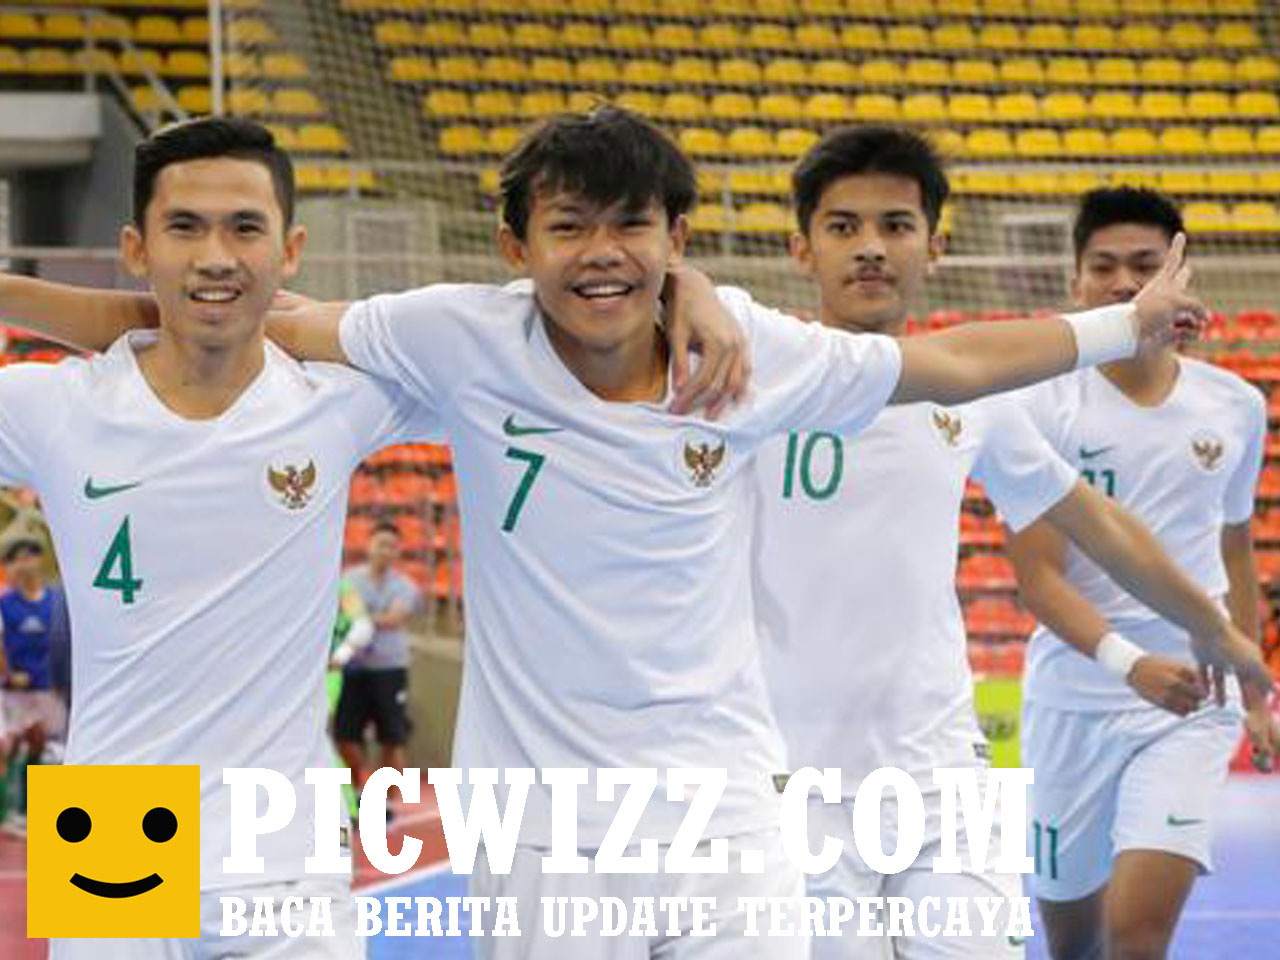 Buat Jersey Futsal Vendor Jersey Zavrel Indonesia